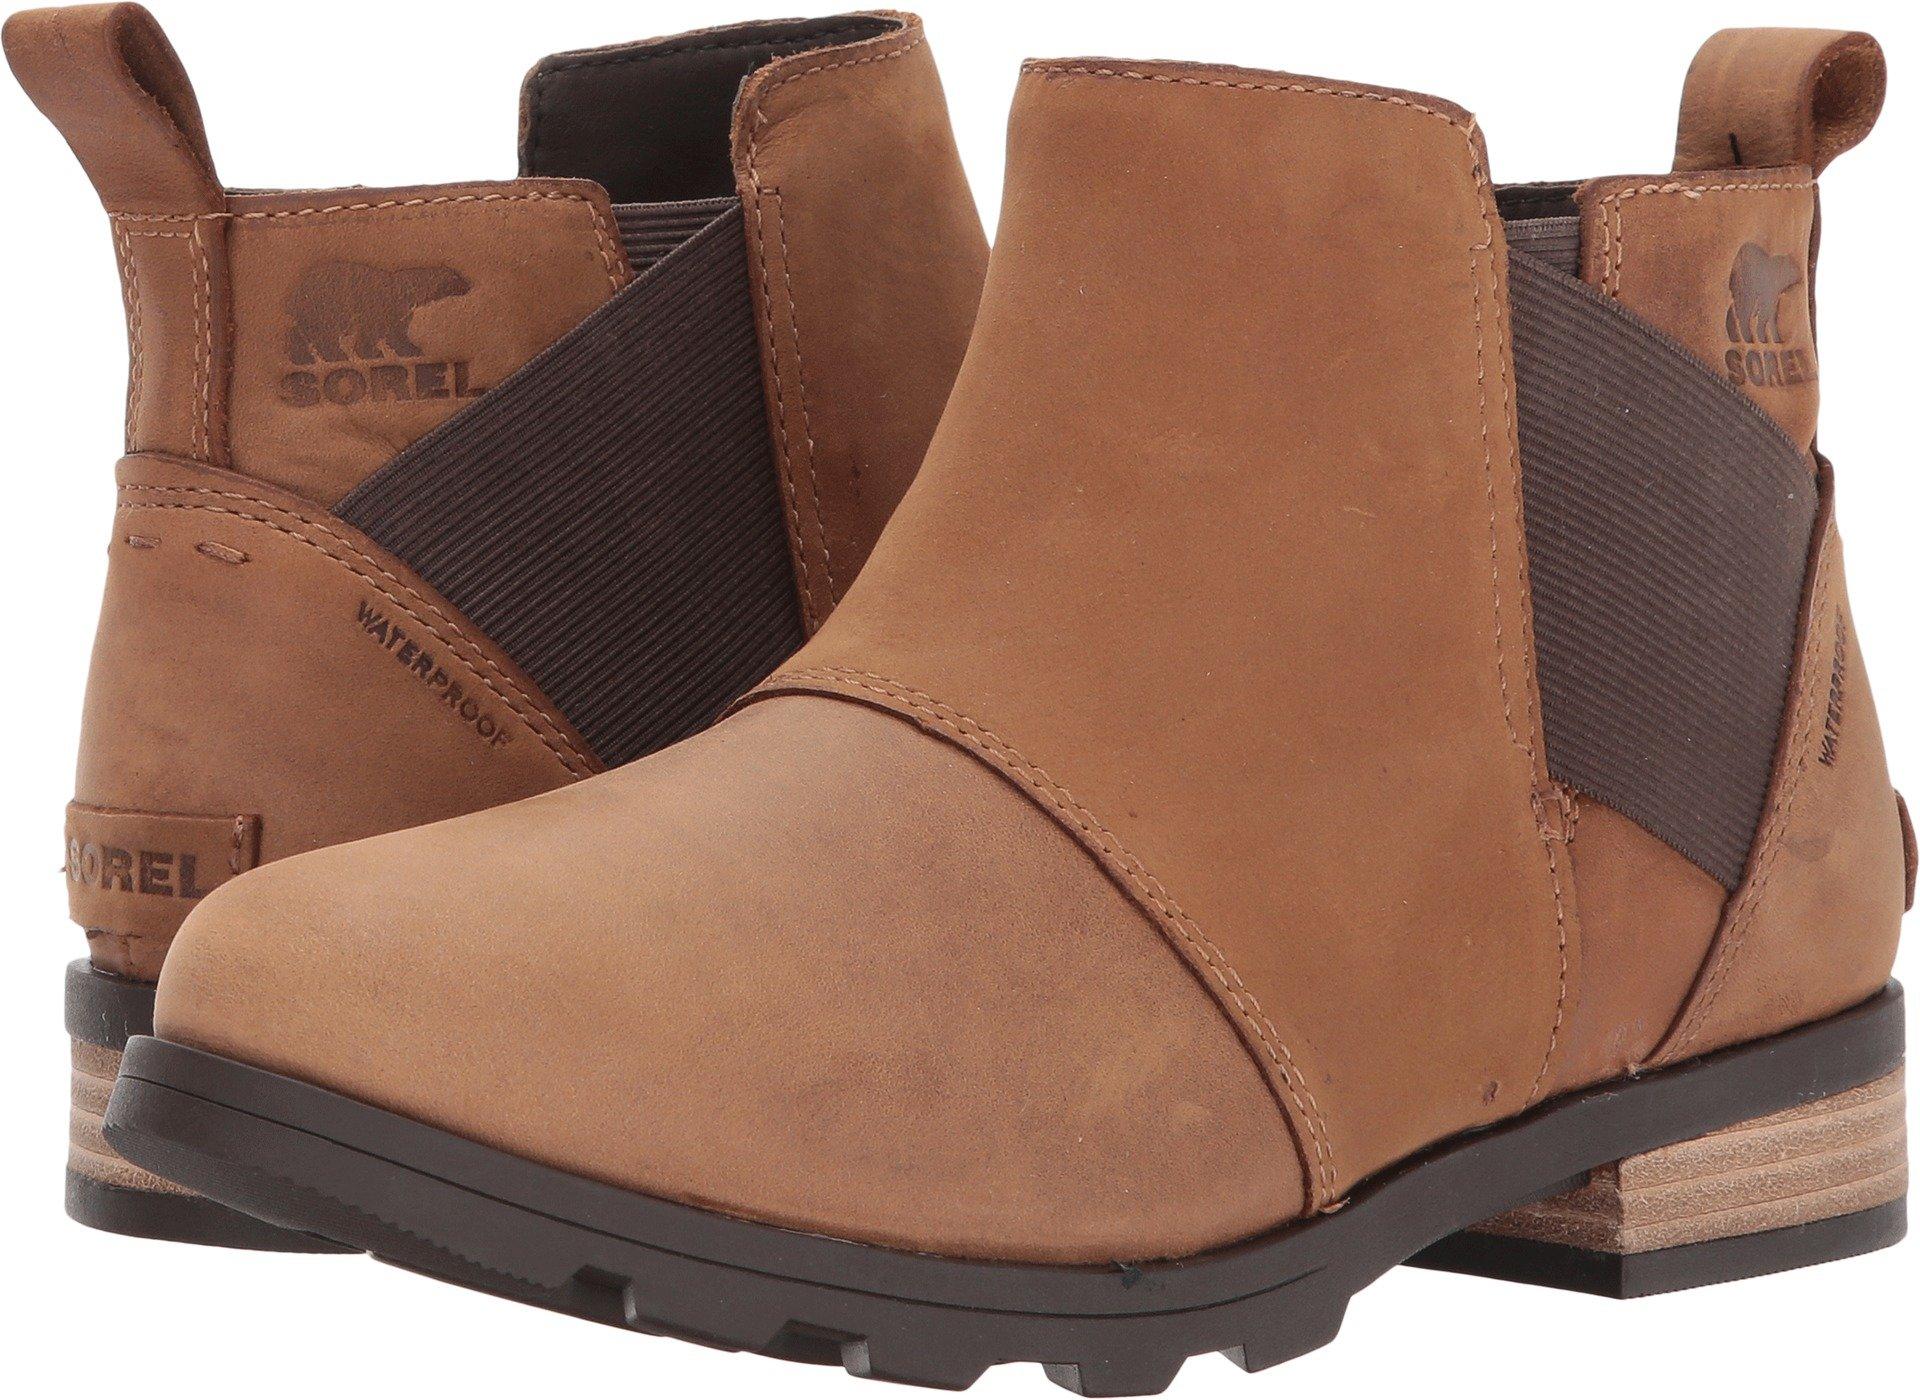 SOREL Women's Emelie Chelsea Non Shell Boot, Size: 6 B(M) US, Color Elk/Cordovan